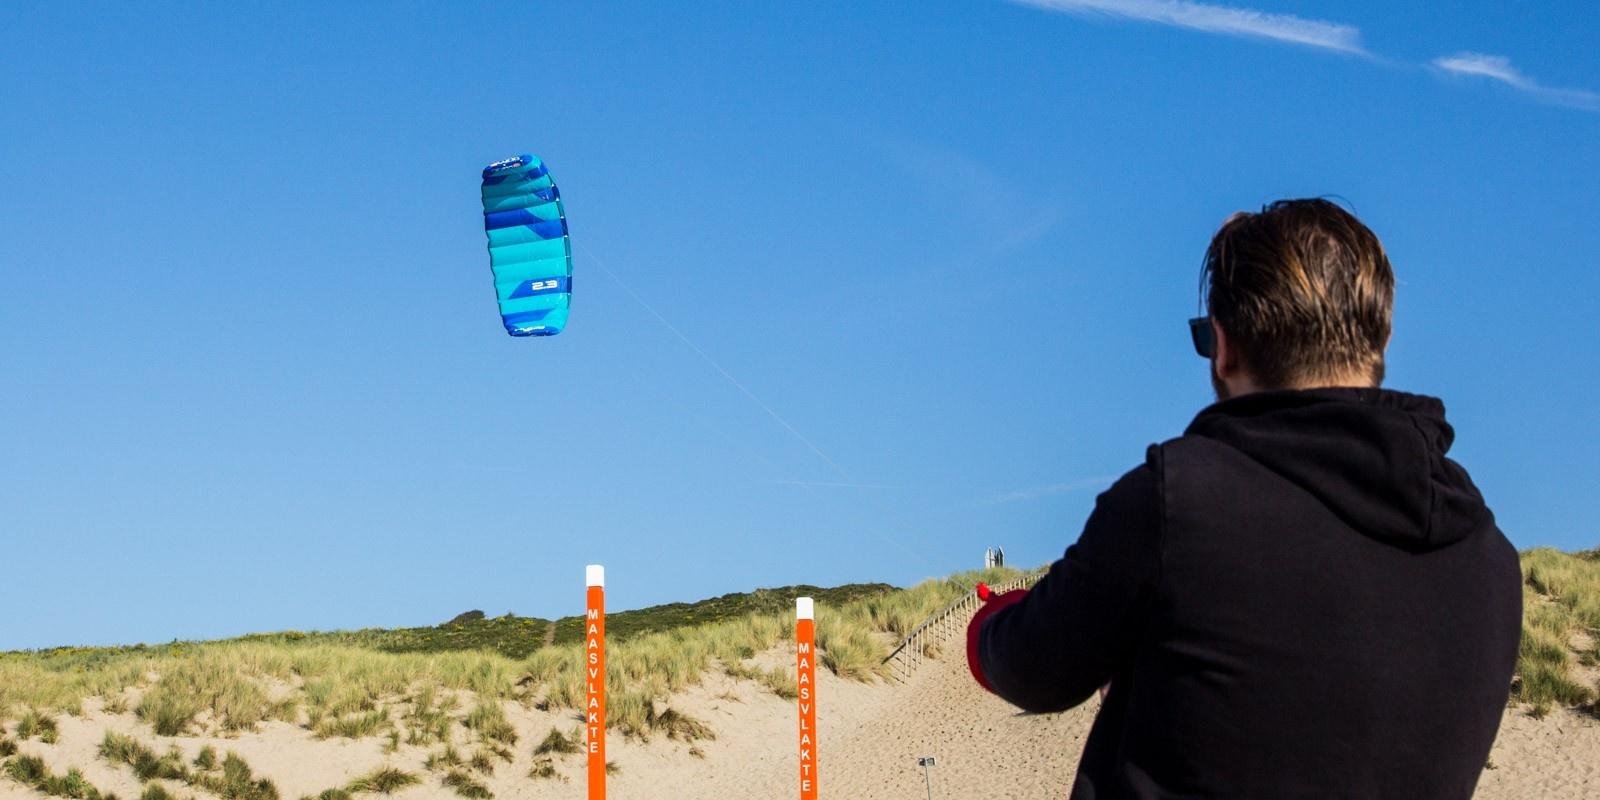 Kites ESKO Diveworld Funsports